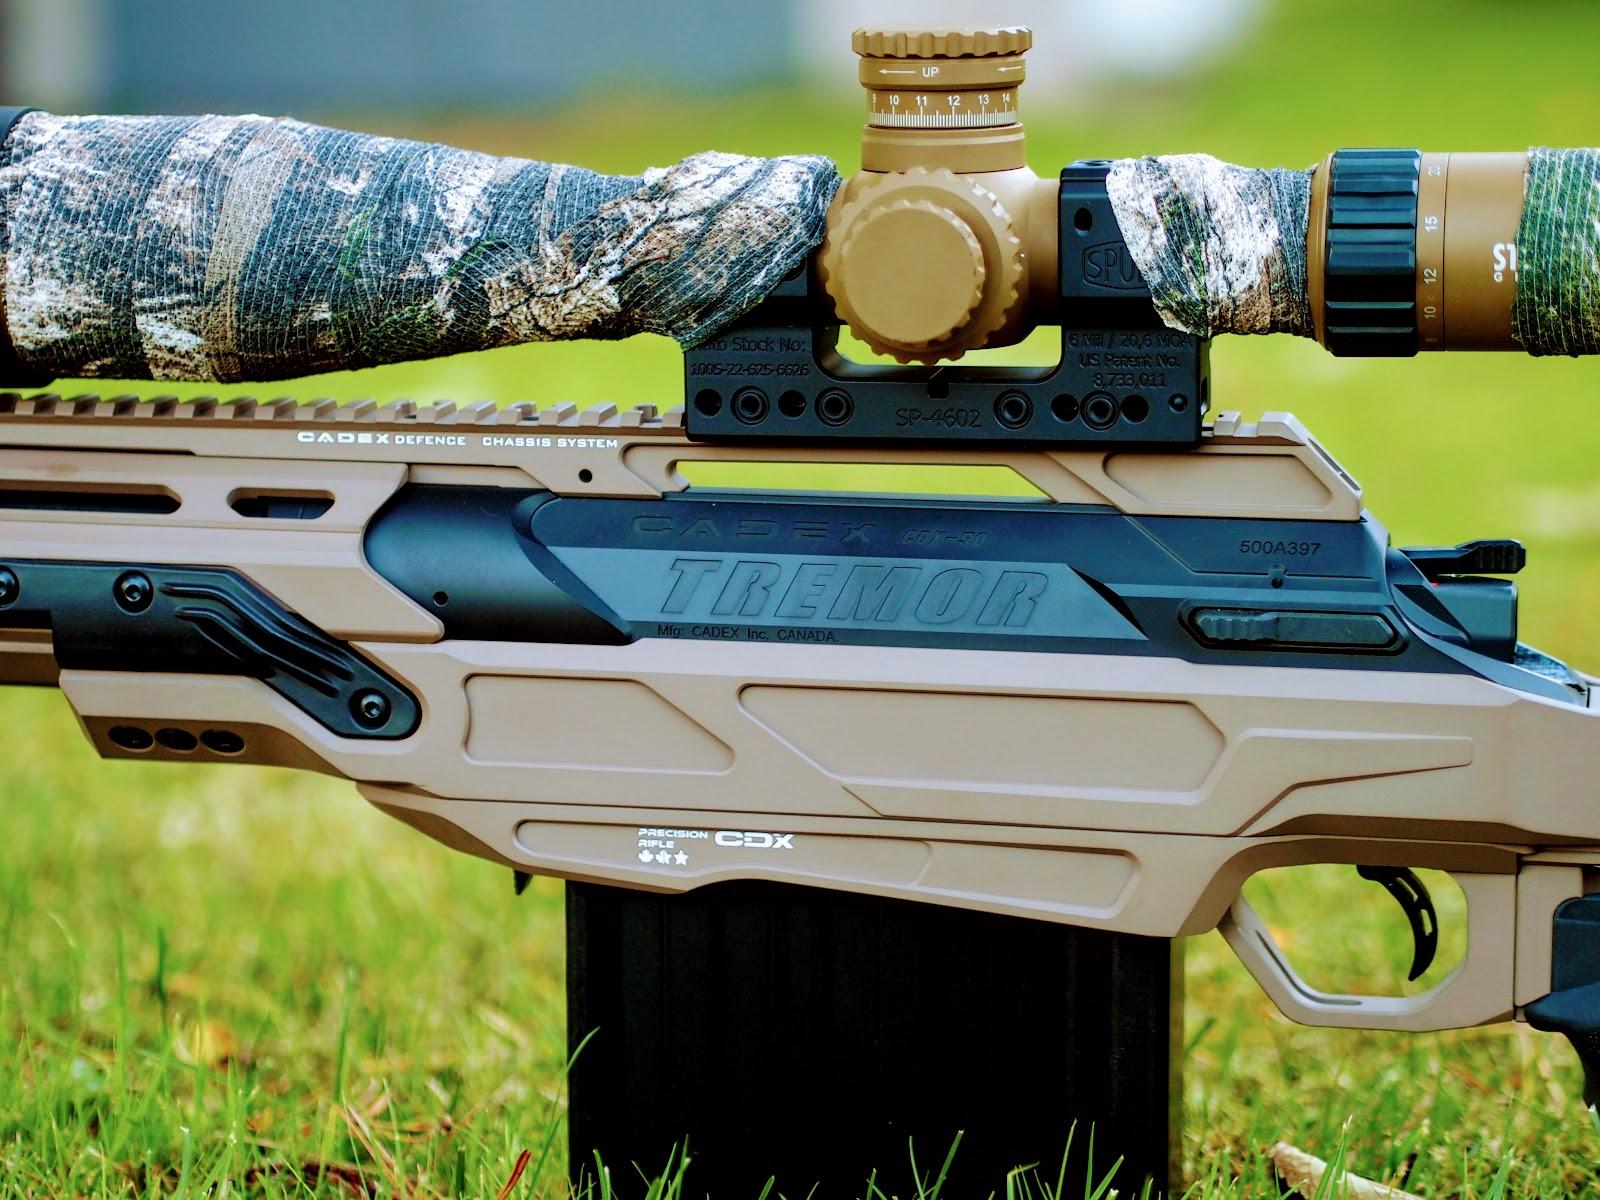 Cadex CDX-50 TREMOR unboxing and quick photo shoot - AR15 COM